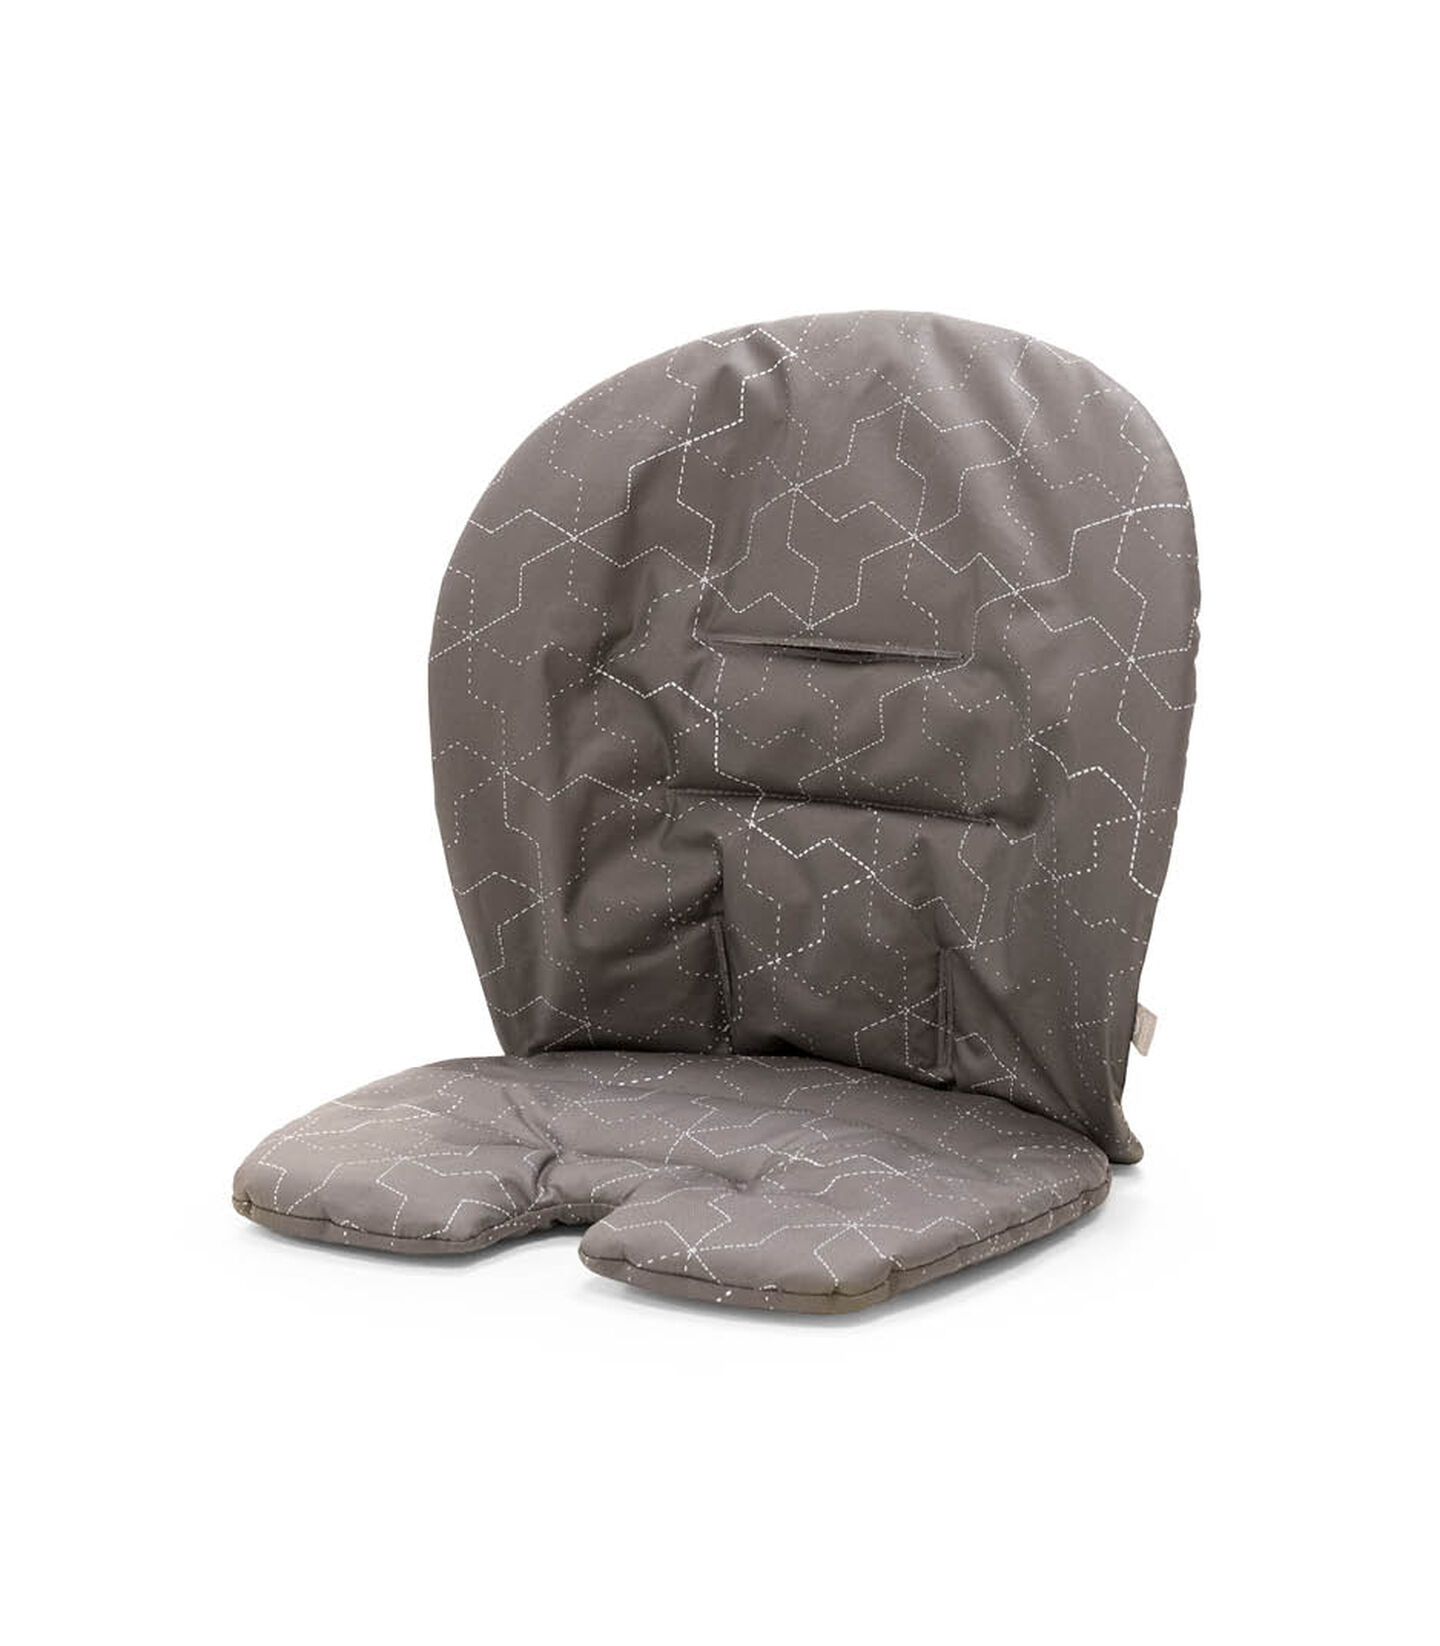 Stokke® Steps™ Baby Set Cushion Geometric Grey, Geometric Grey, mainview view 1